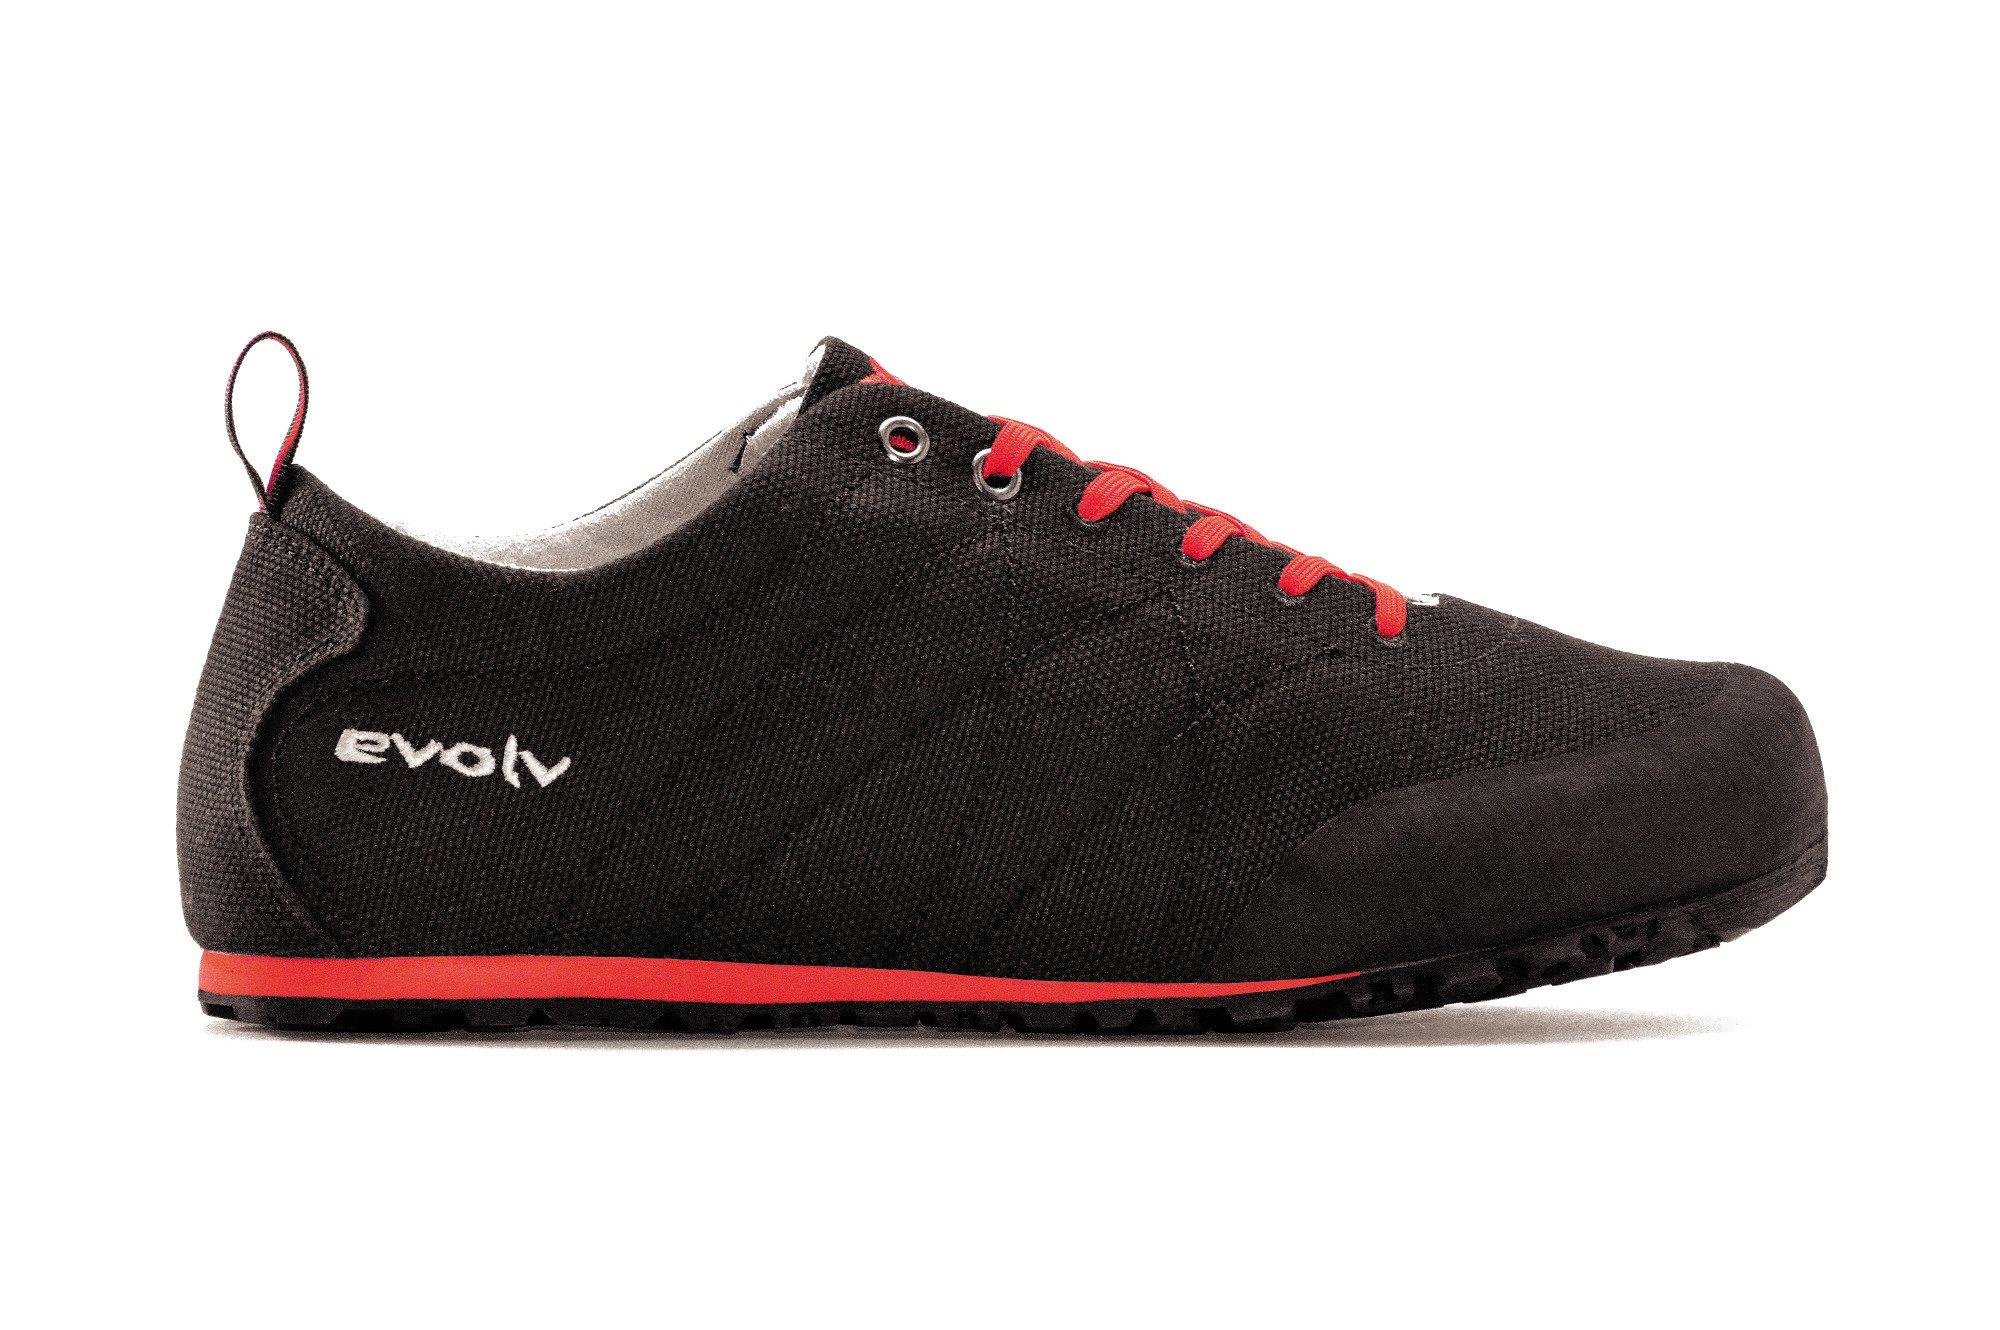 Evolv Cruzer Psyche Approach Shoe - Black 10.5